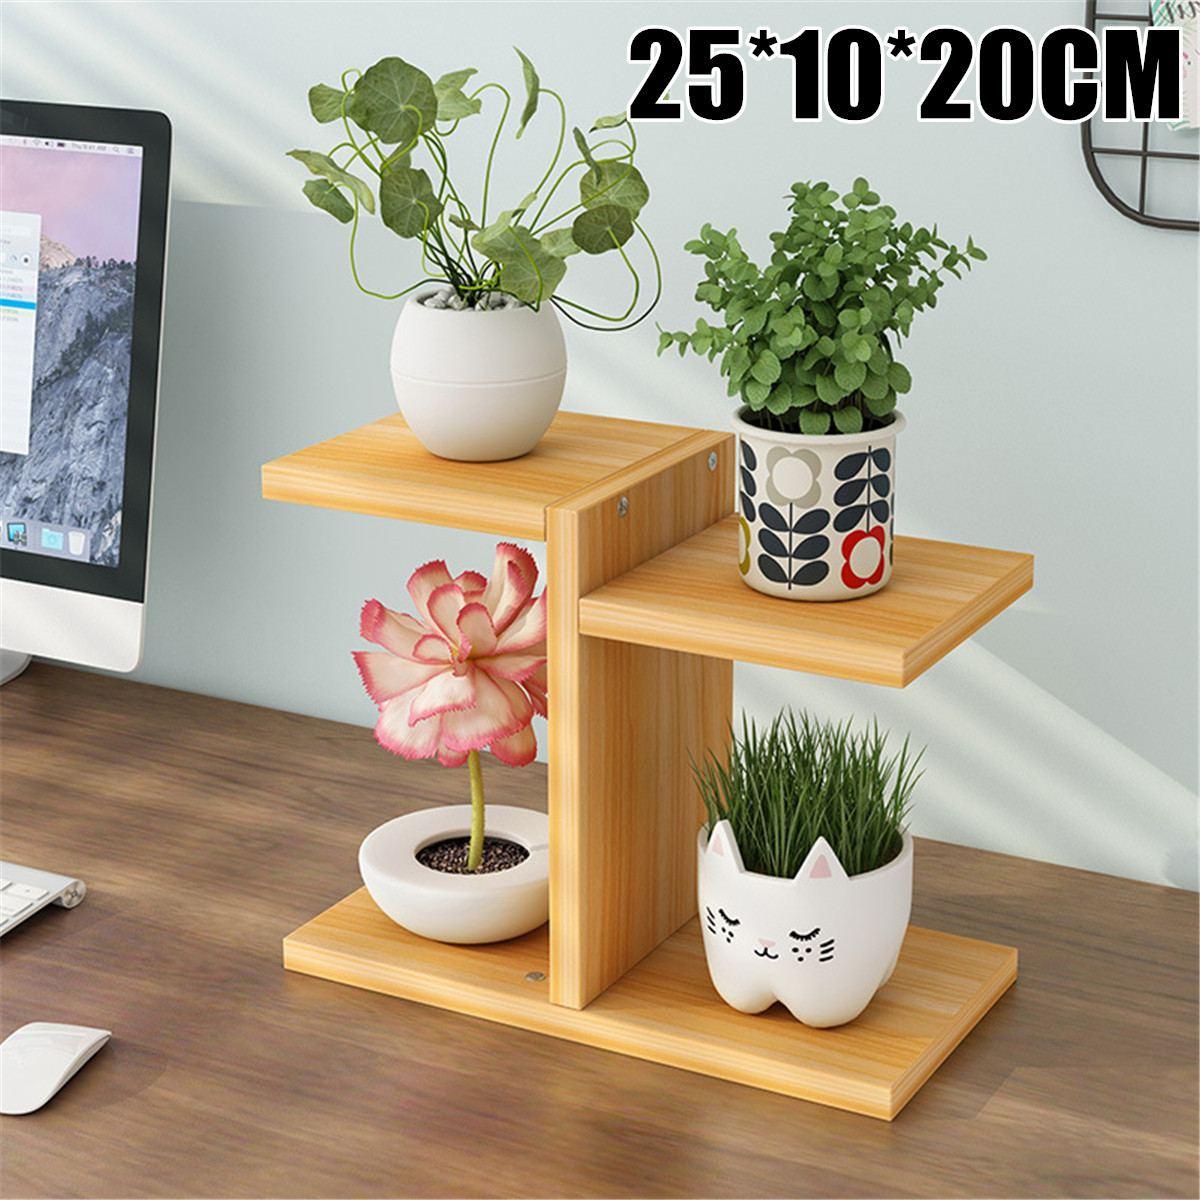 Simple Wooden Plant Shelves Desktop Flower Rack Stand Flower Display Stand Storage Shelf Organizer Home Desk Balcony Garden